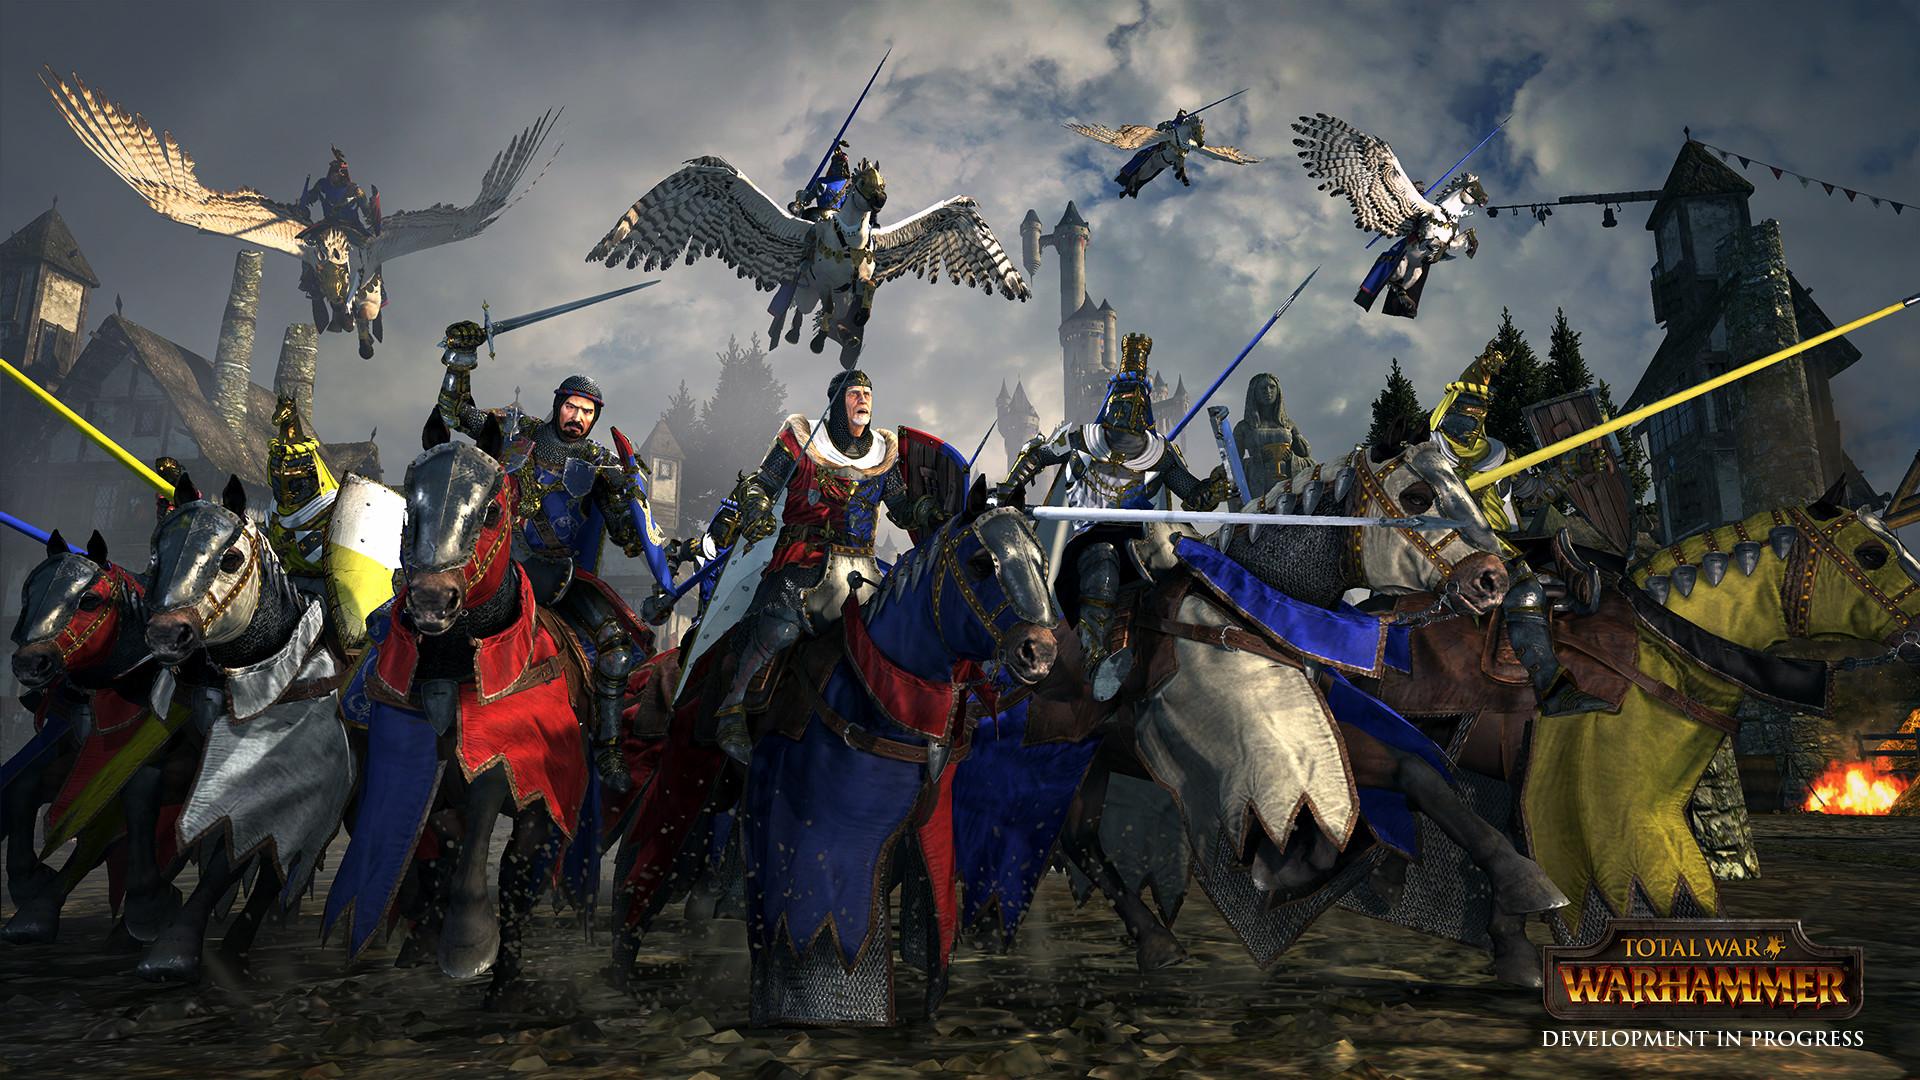 Alberich, par (auteur inconnu), in Total War: Warhammer, capture par  JackDays   #àTrier #Bretonnie #Ordre #TotalWar #Warhammer   Pinterest   Total  war